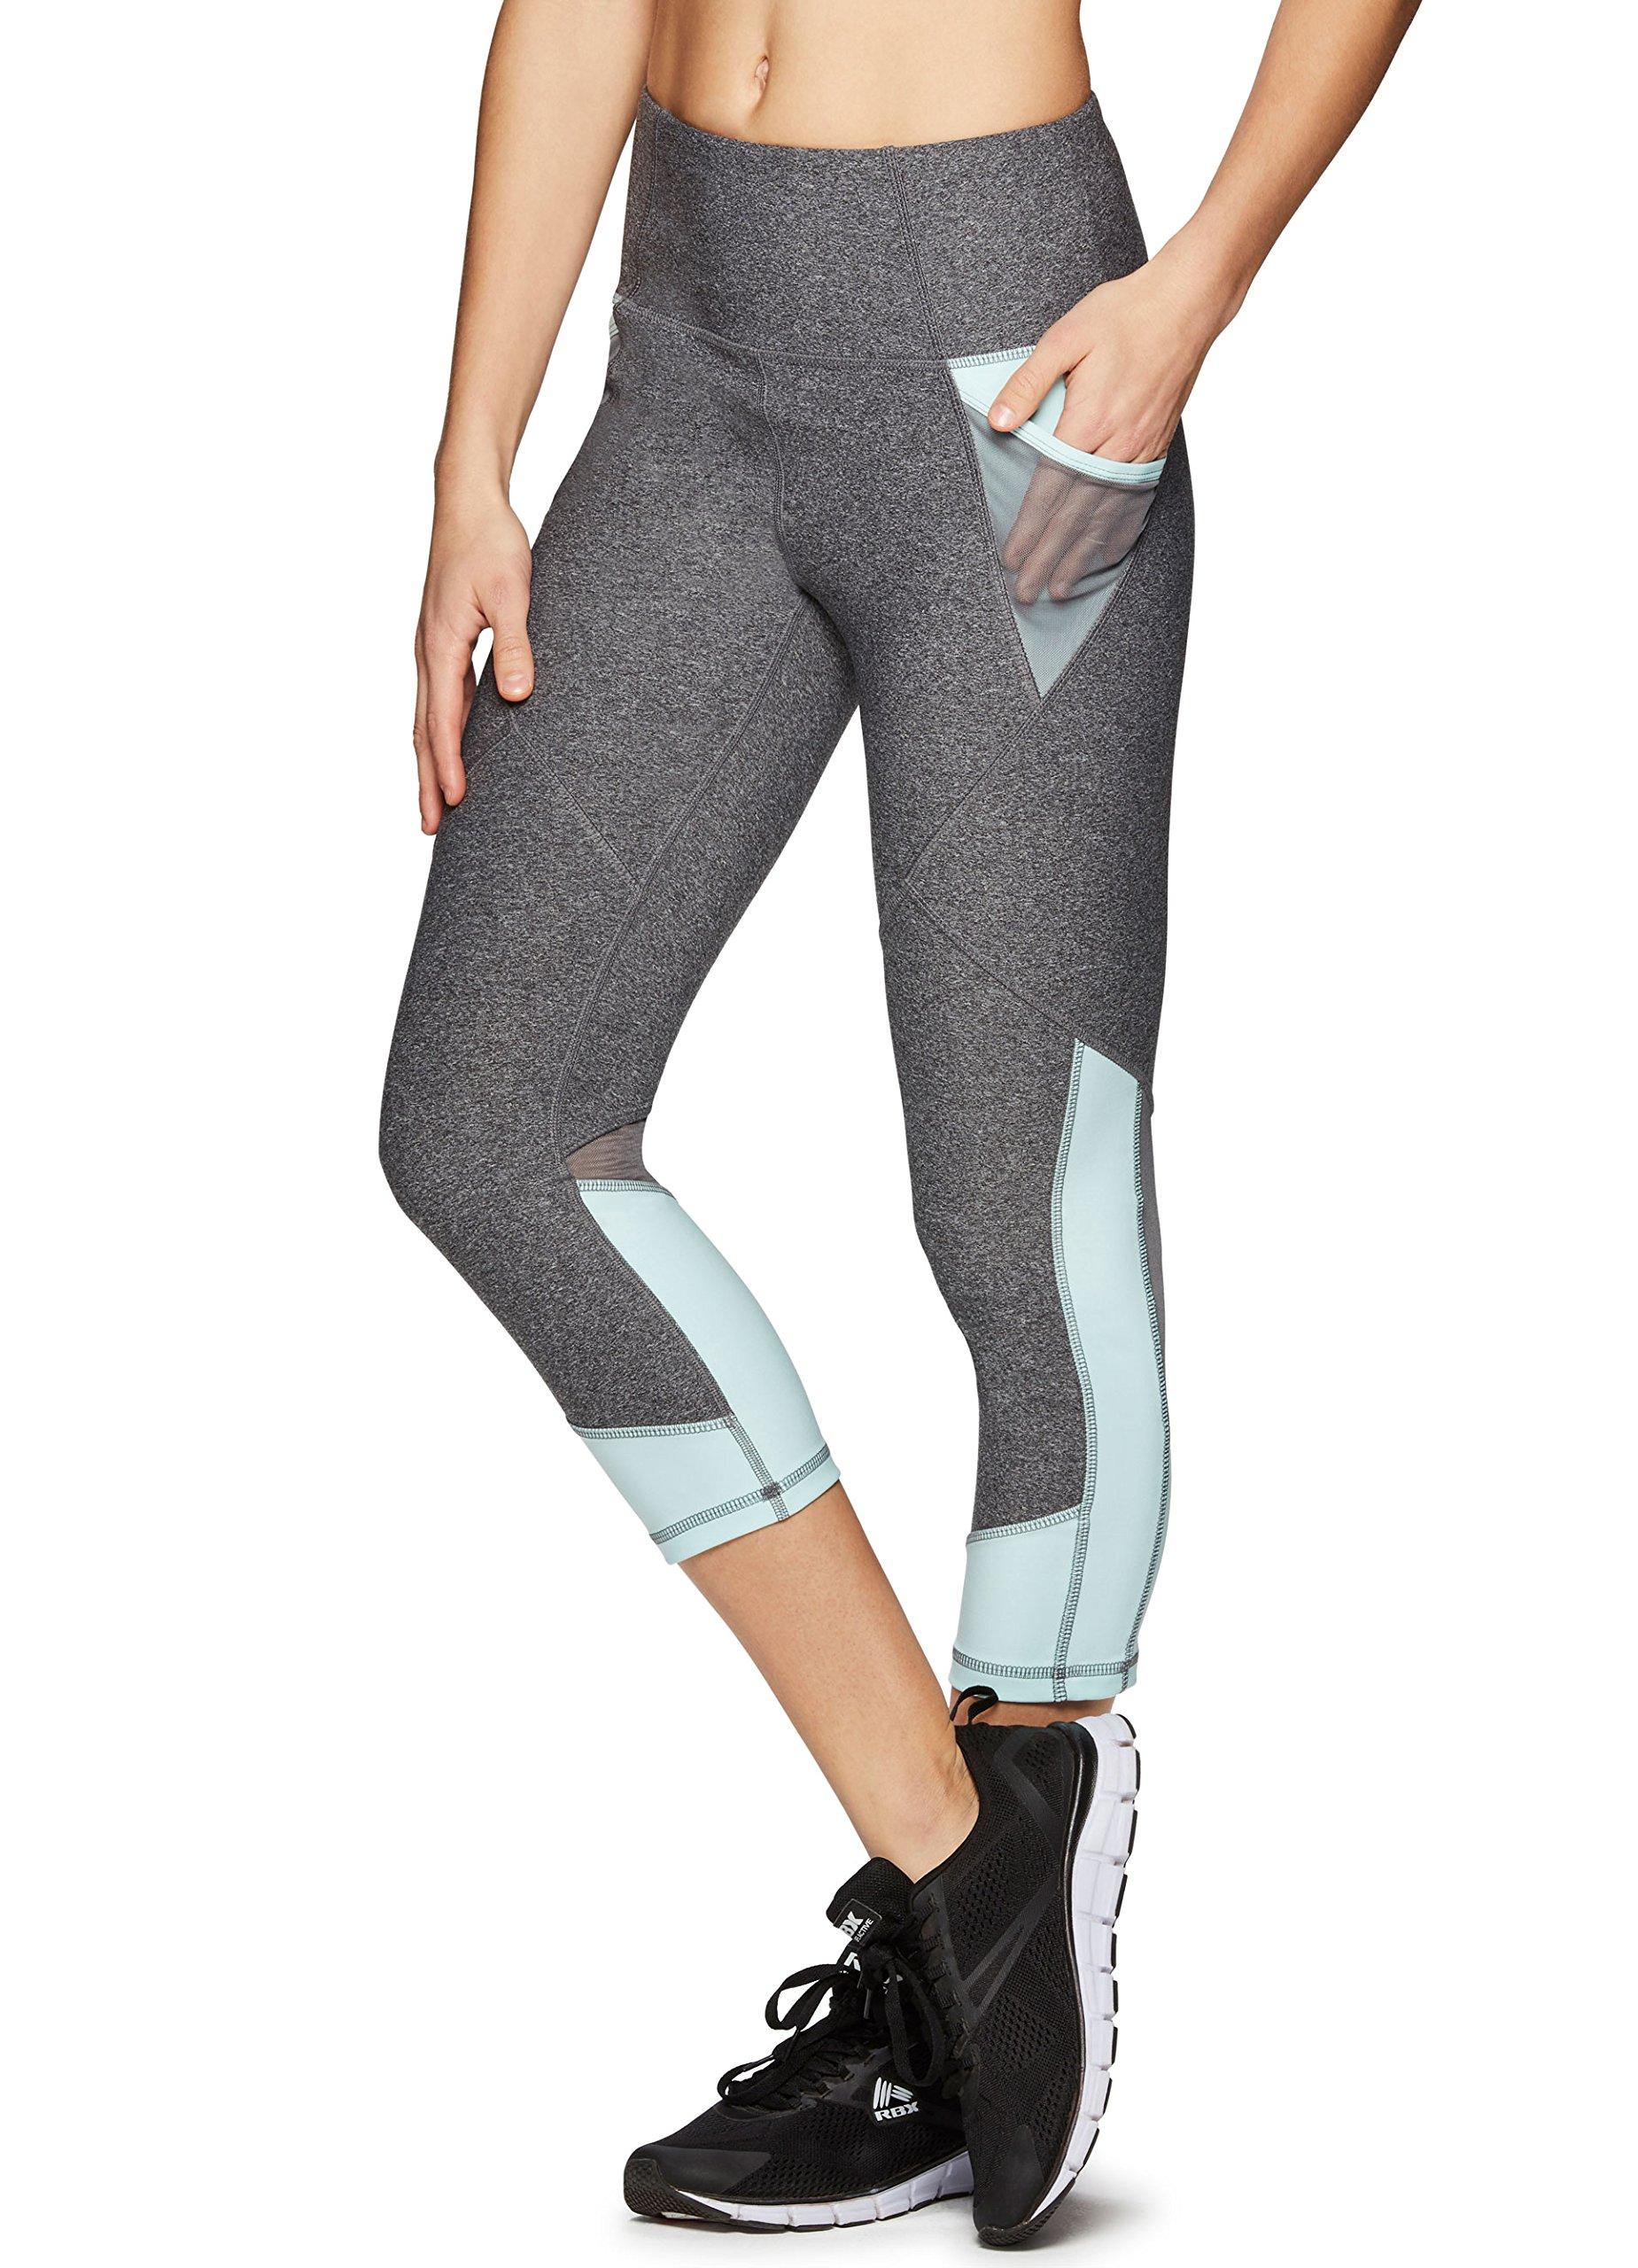 RBX Active Women's Mesh Tech Pocket Yoga Capri Leggings Charcoal Grey M